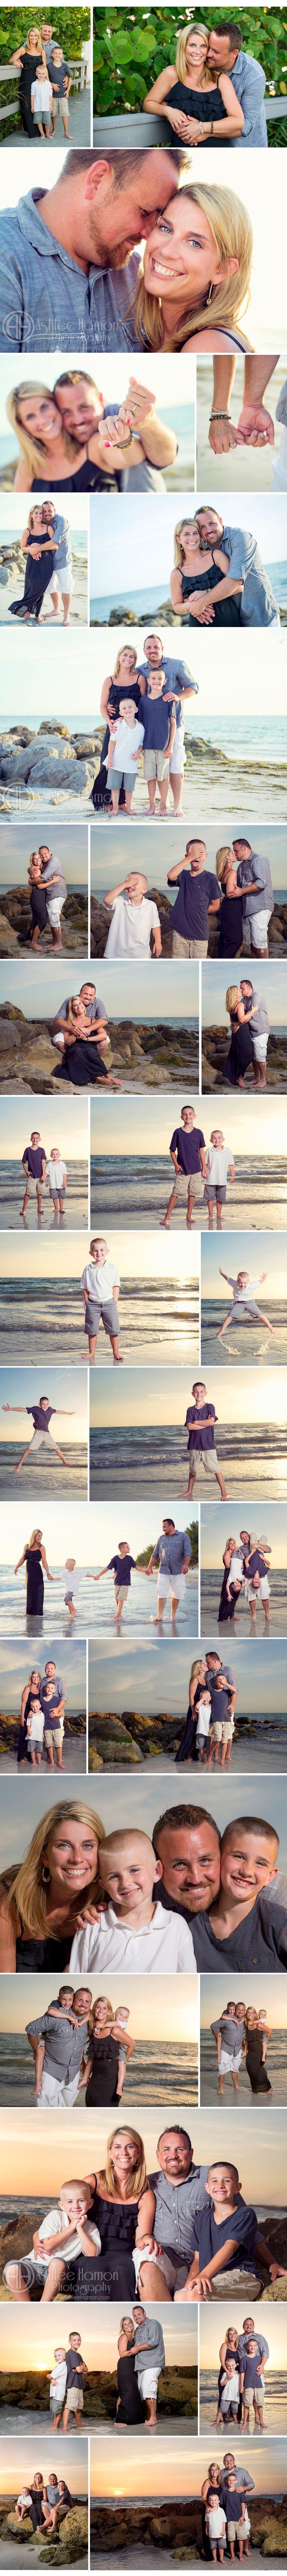 Beach Sunset Family Photos  www.ashleehamon.com